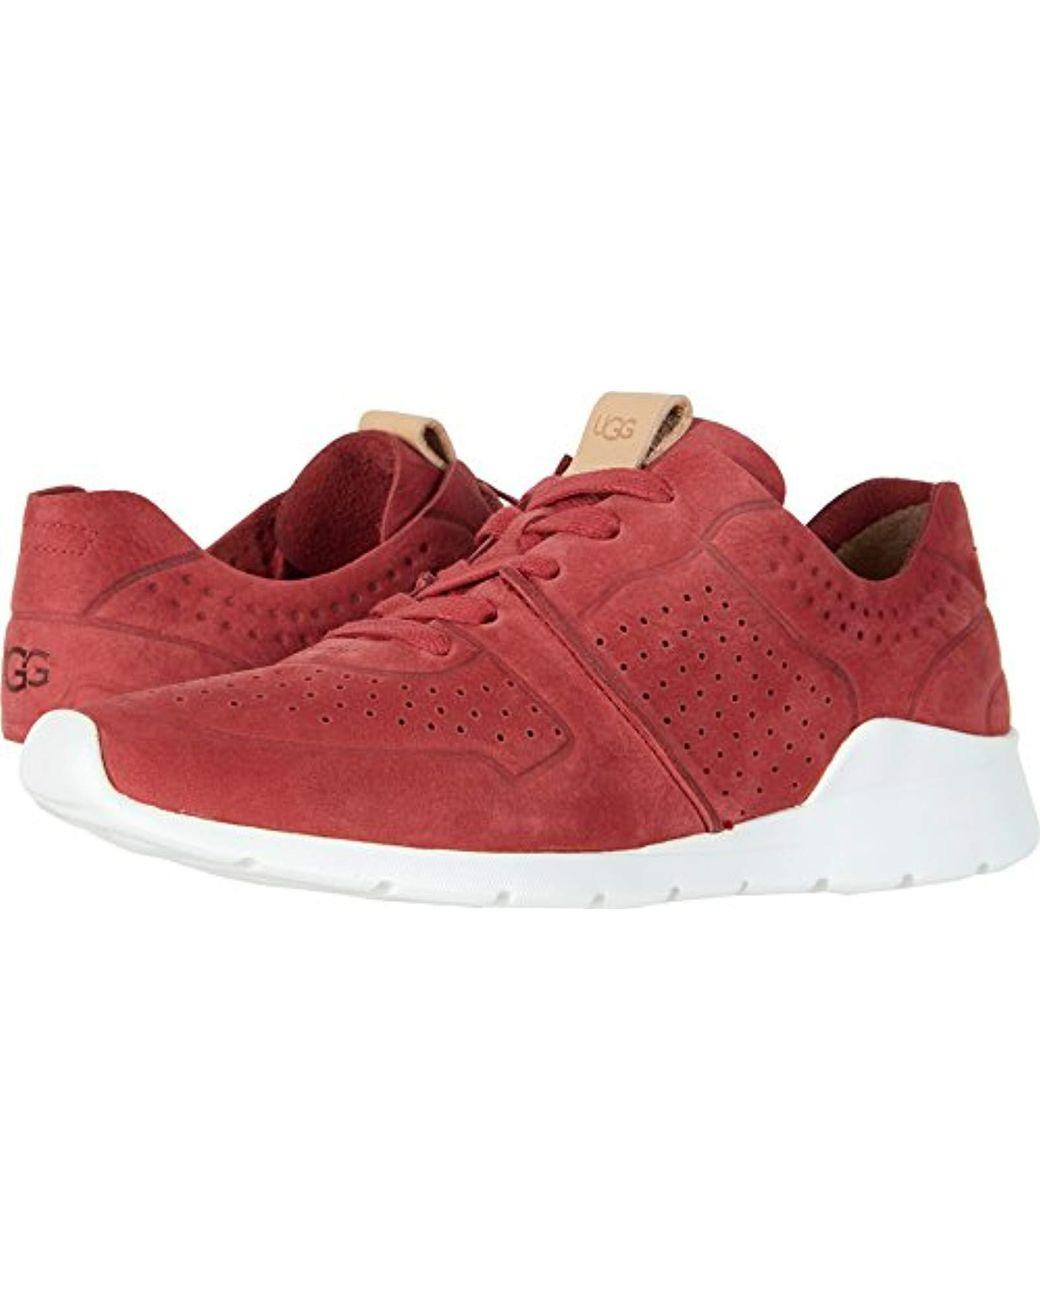 e1dd61a8b37 Women's Red Tye Fashion Sneaker